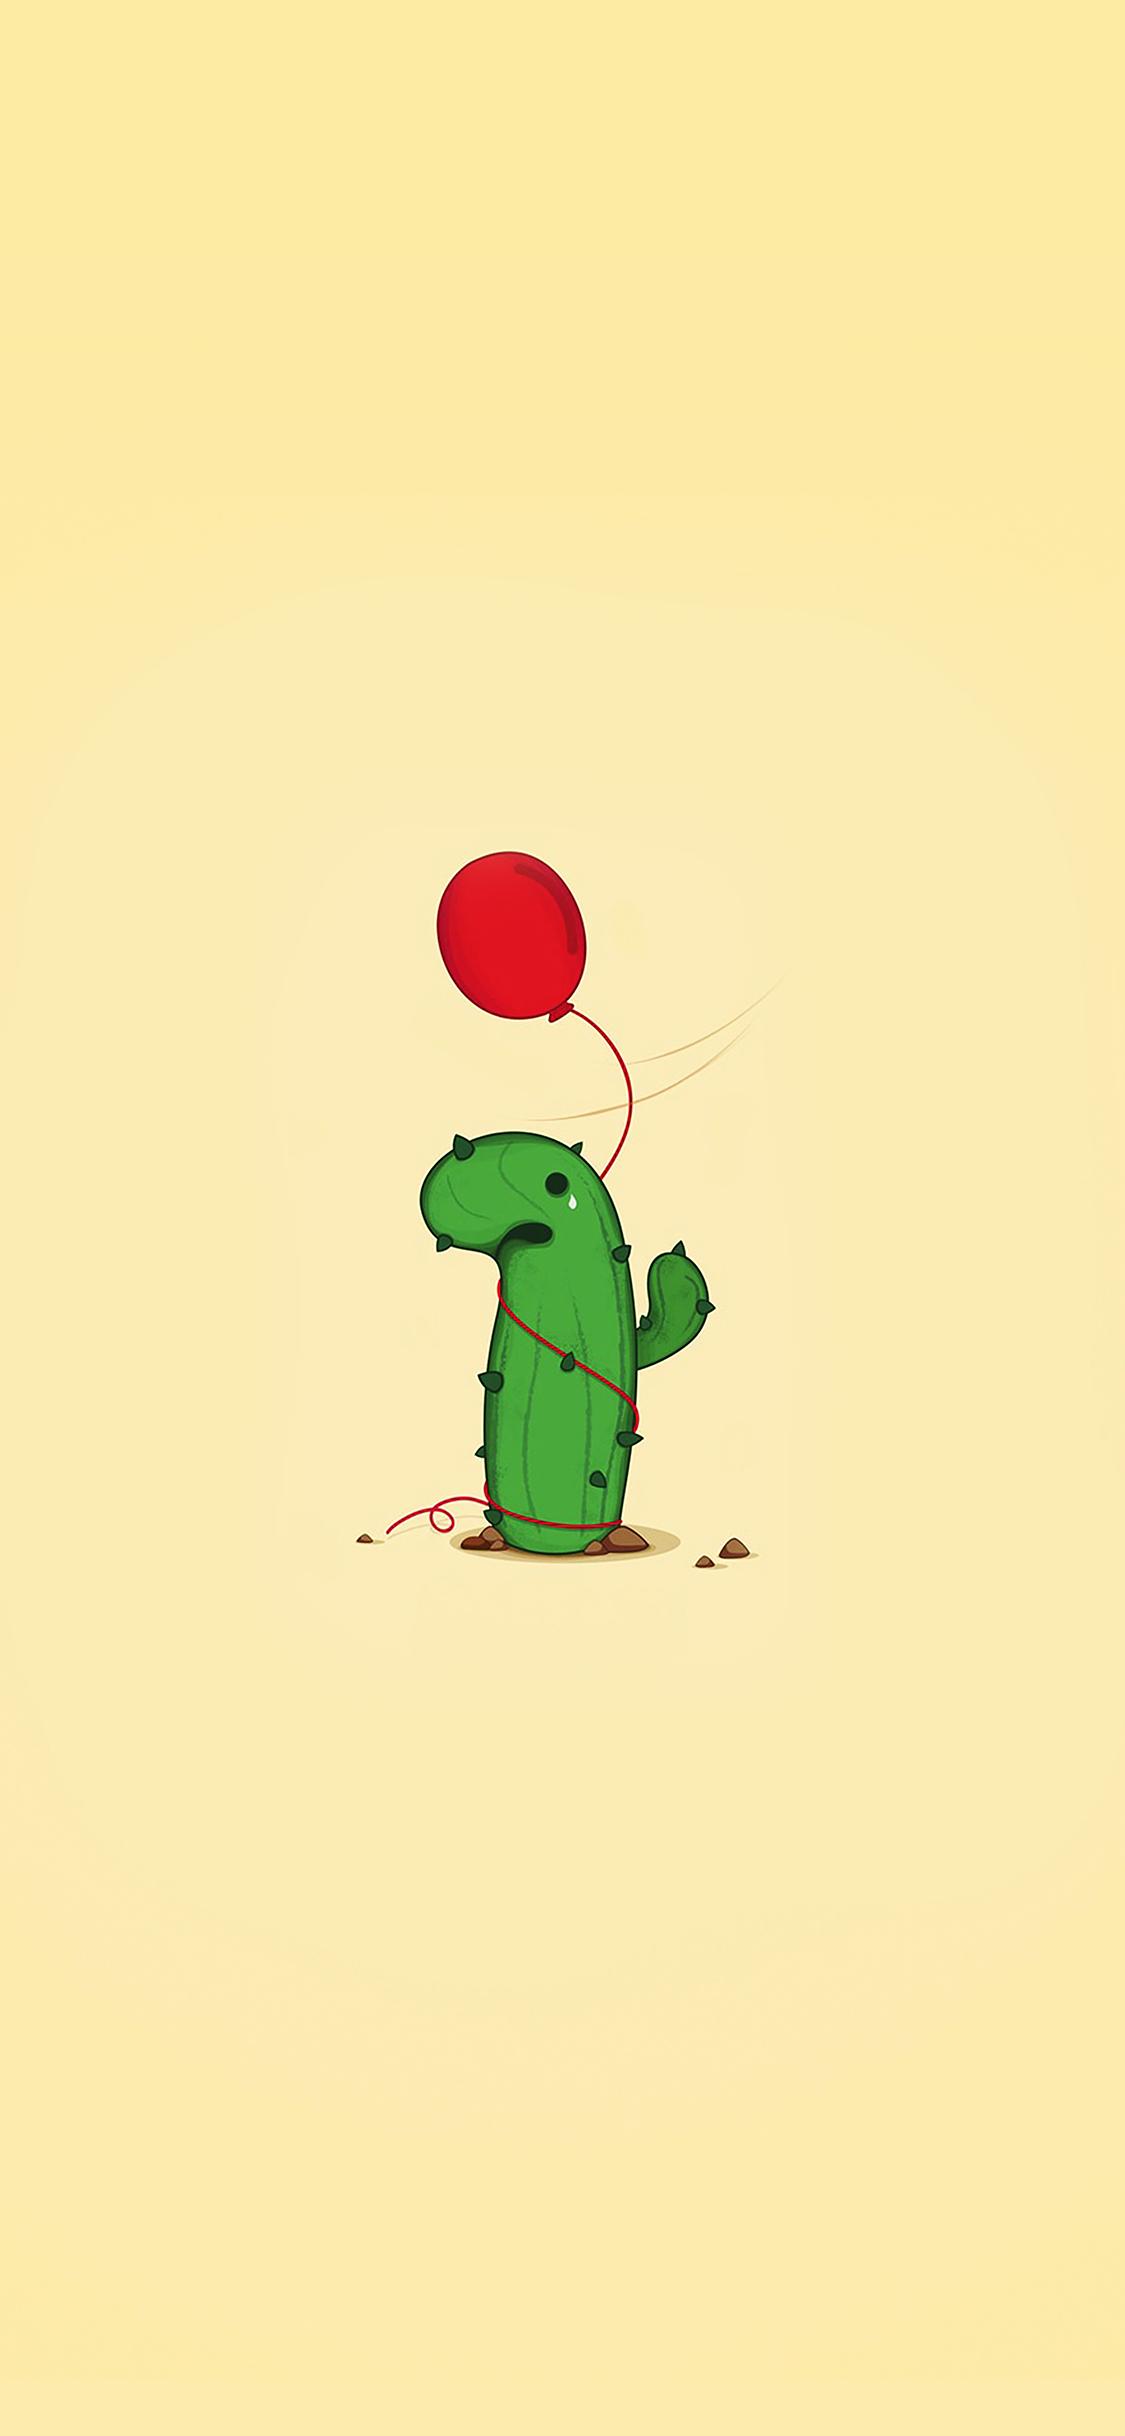 Cute Cactus Wallpaper Macbook Ai35 Cute Cactus Ballon Illust Art Minimal